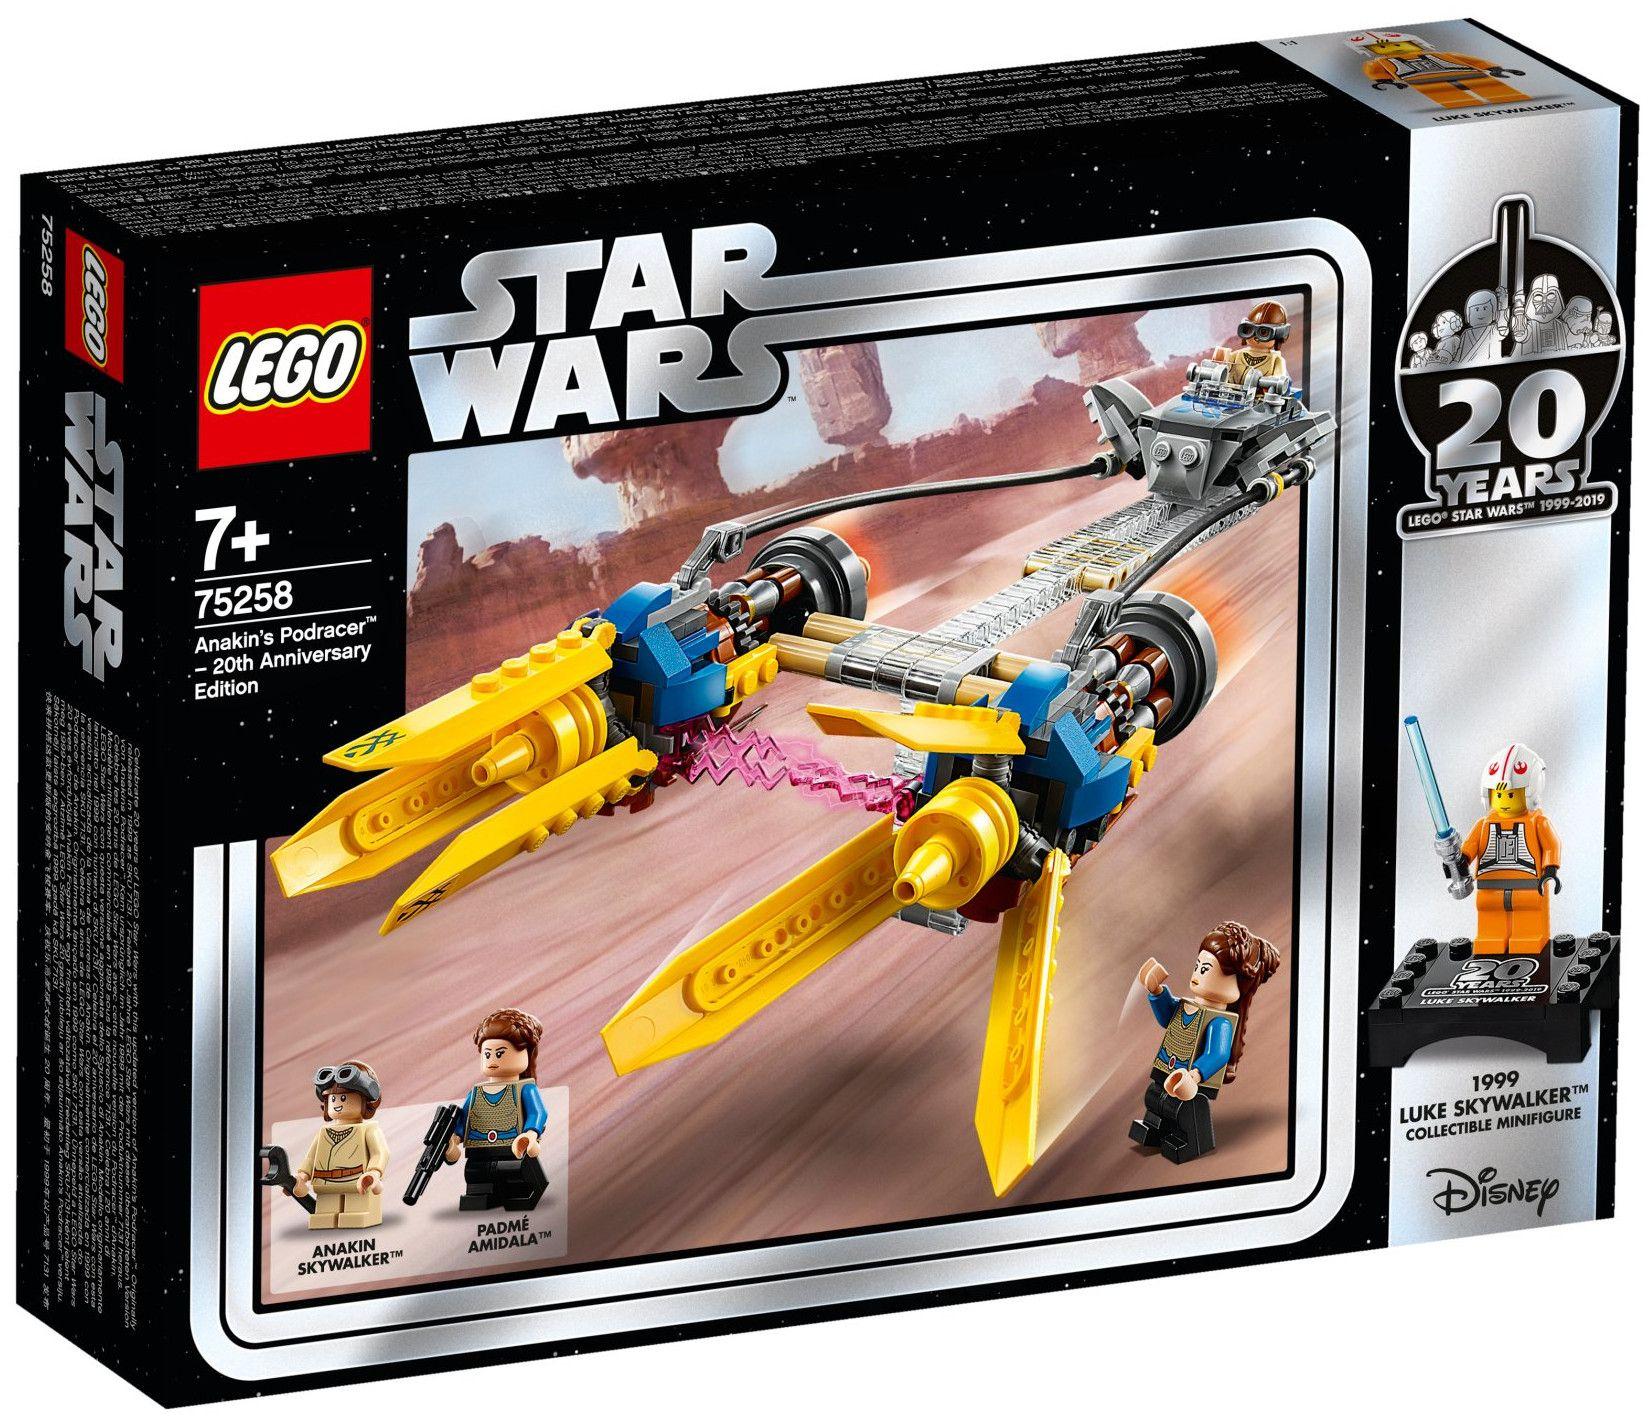 Конструктор Lego Star Wars -  Anakin's Podracer (75258) - 1